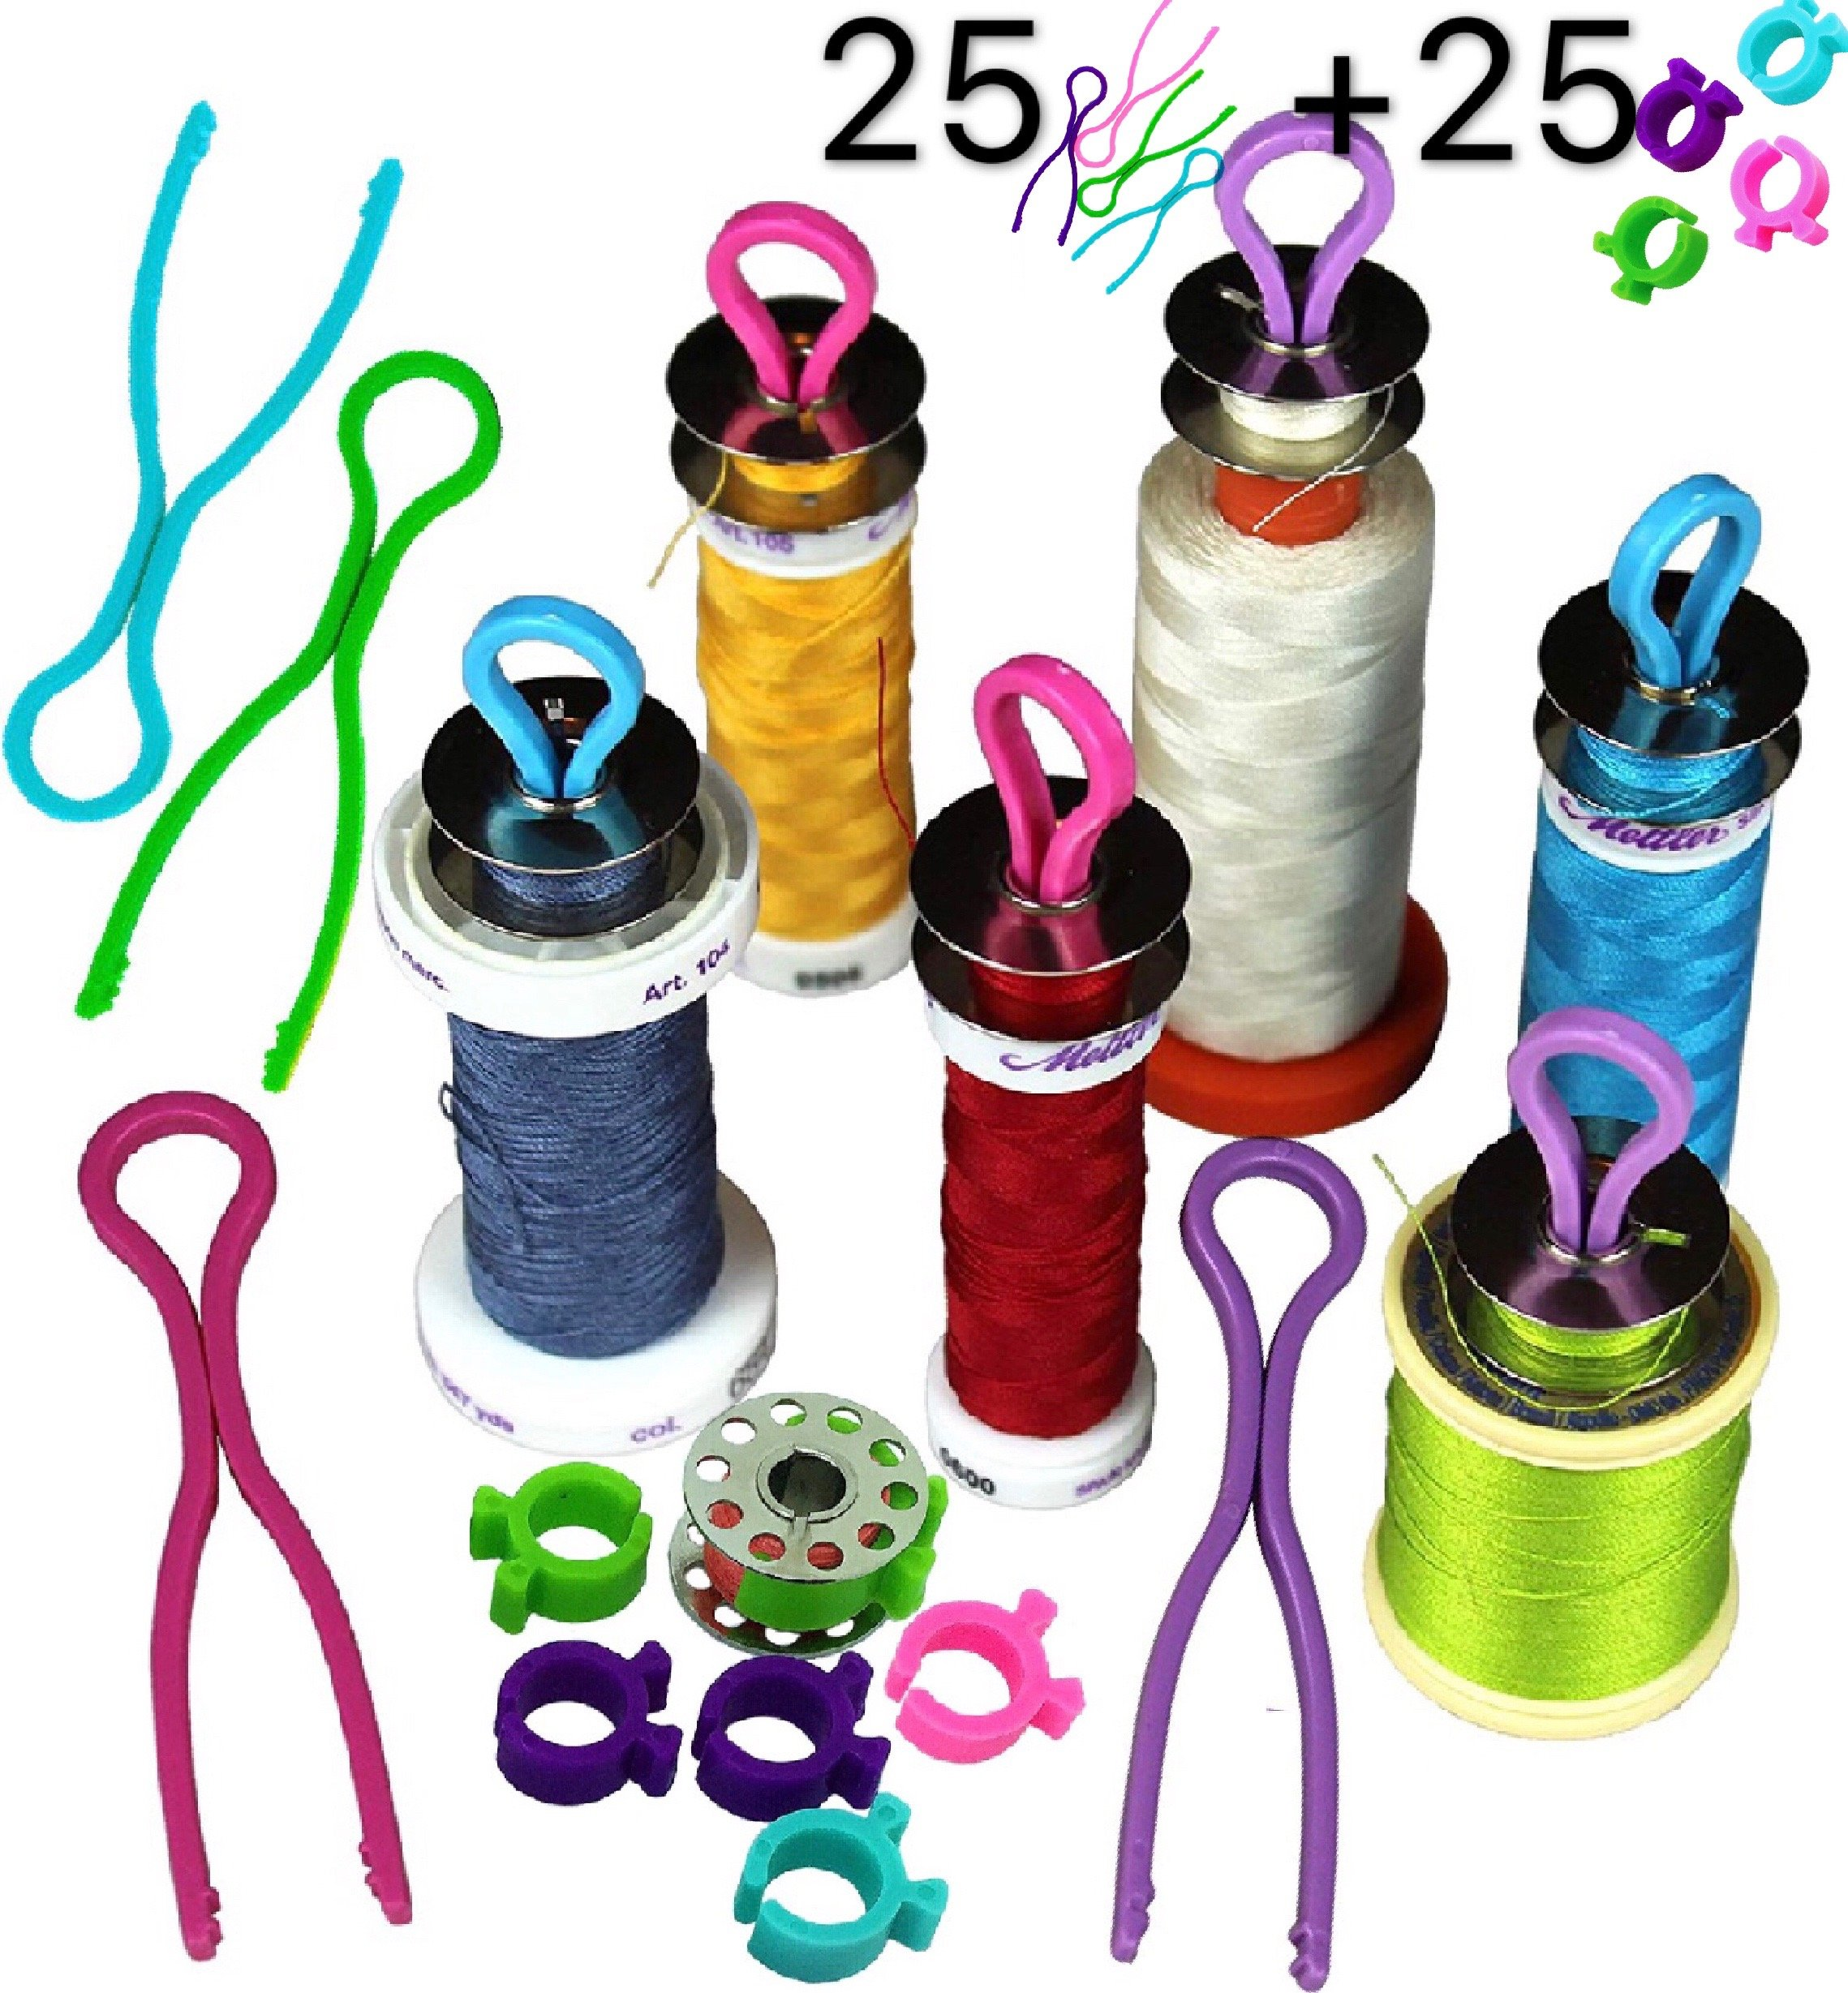 PeavyTailor 50 Pcs Bobbin Buddies Bobbin Holde Clips Thread Organizer Matching Thread Spools Together 25+25